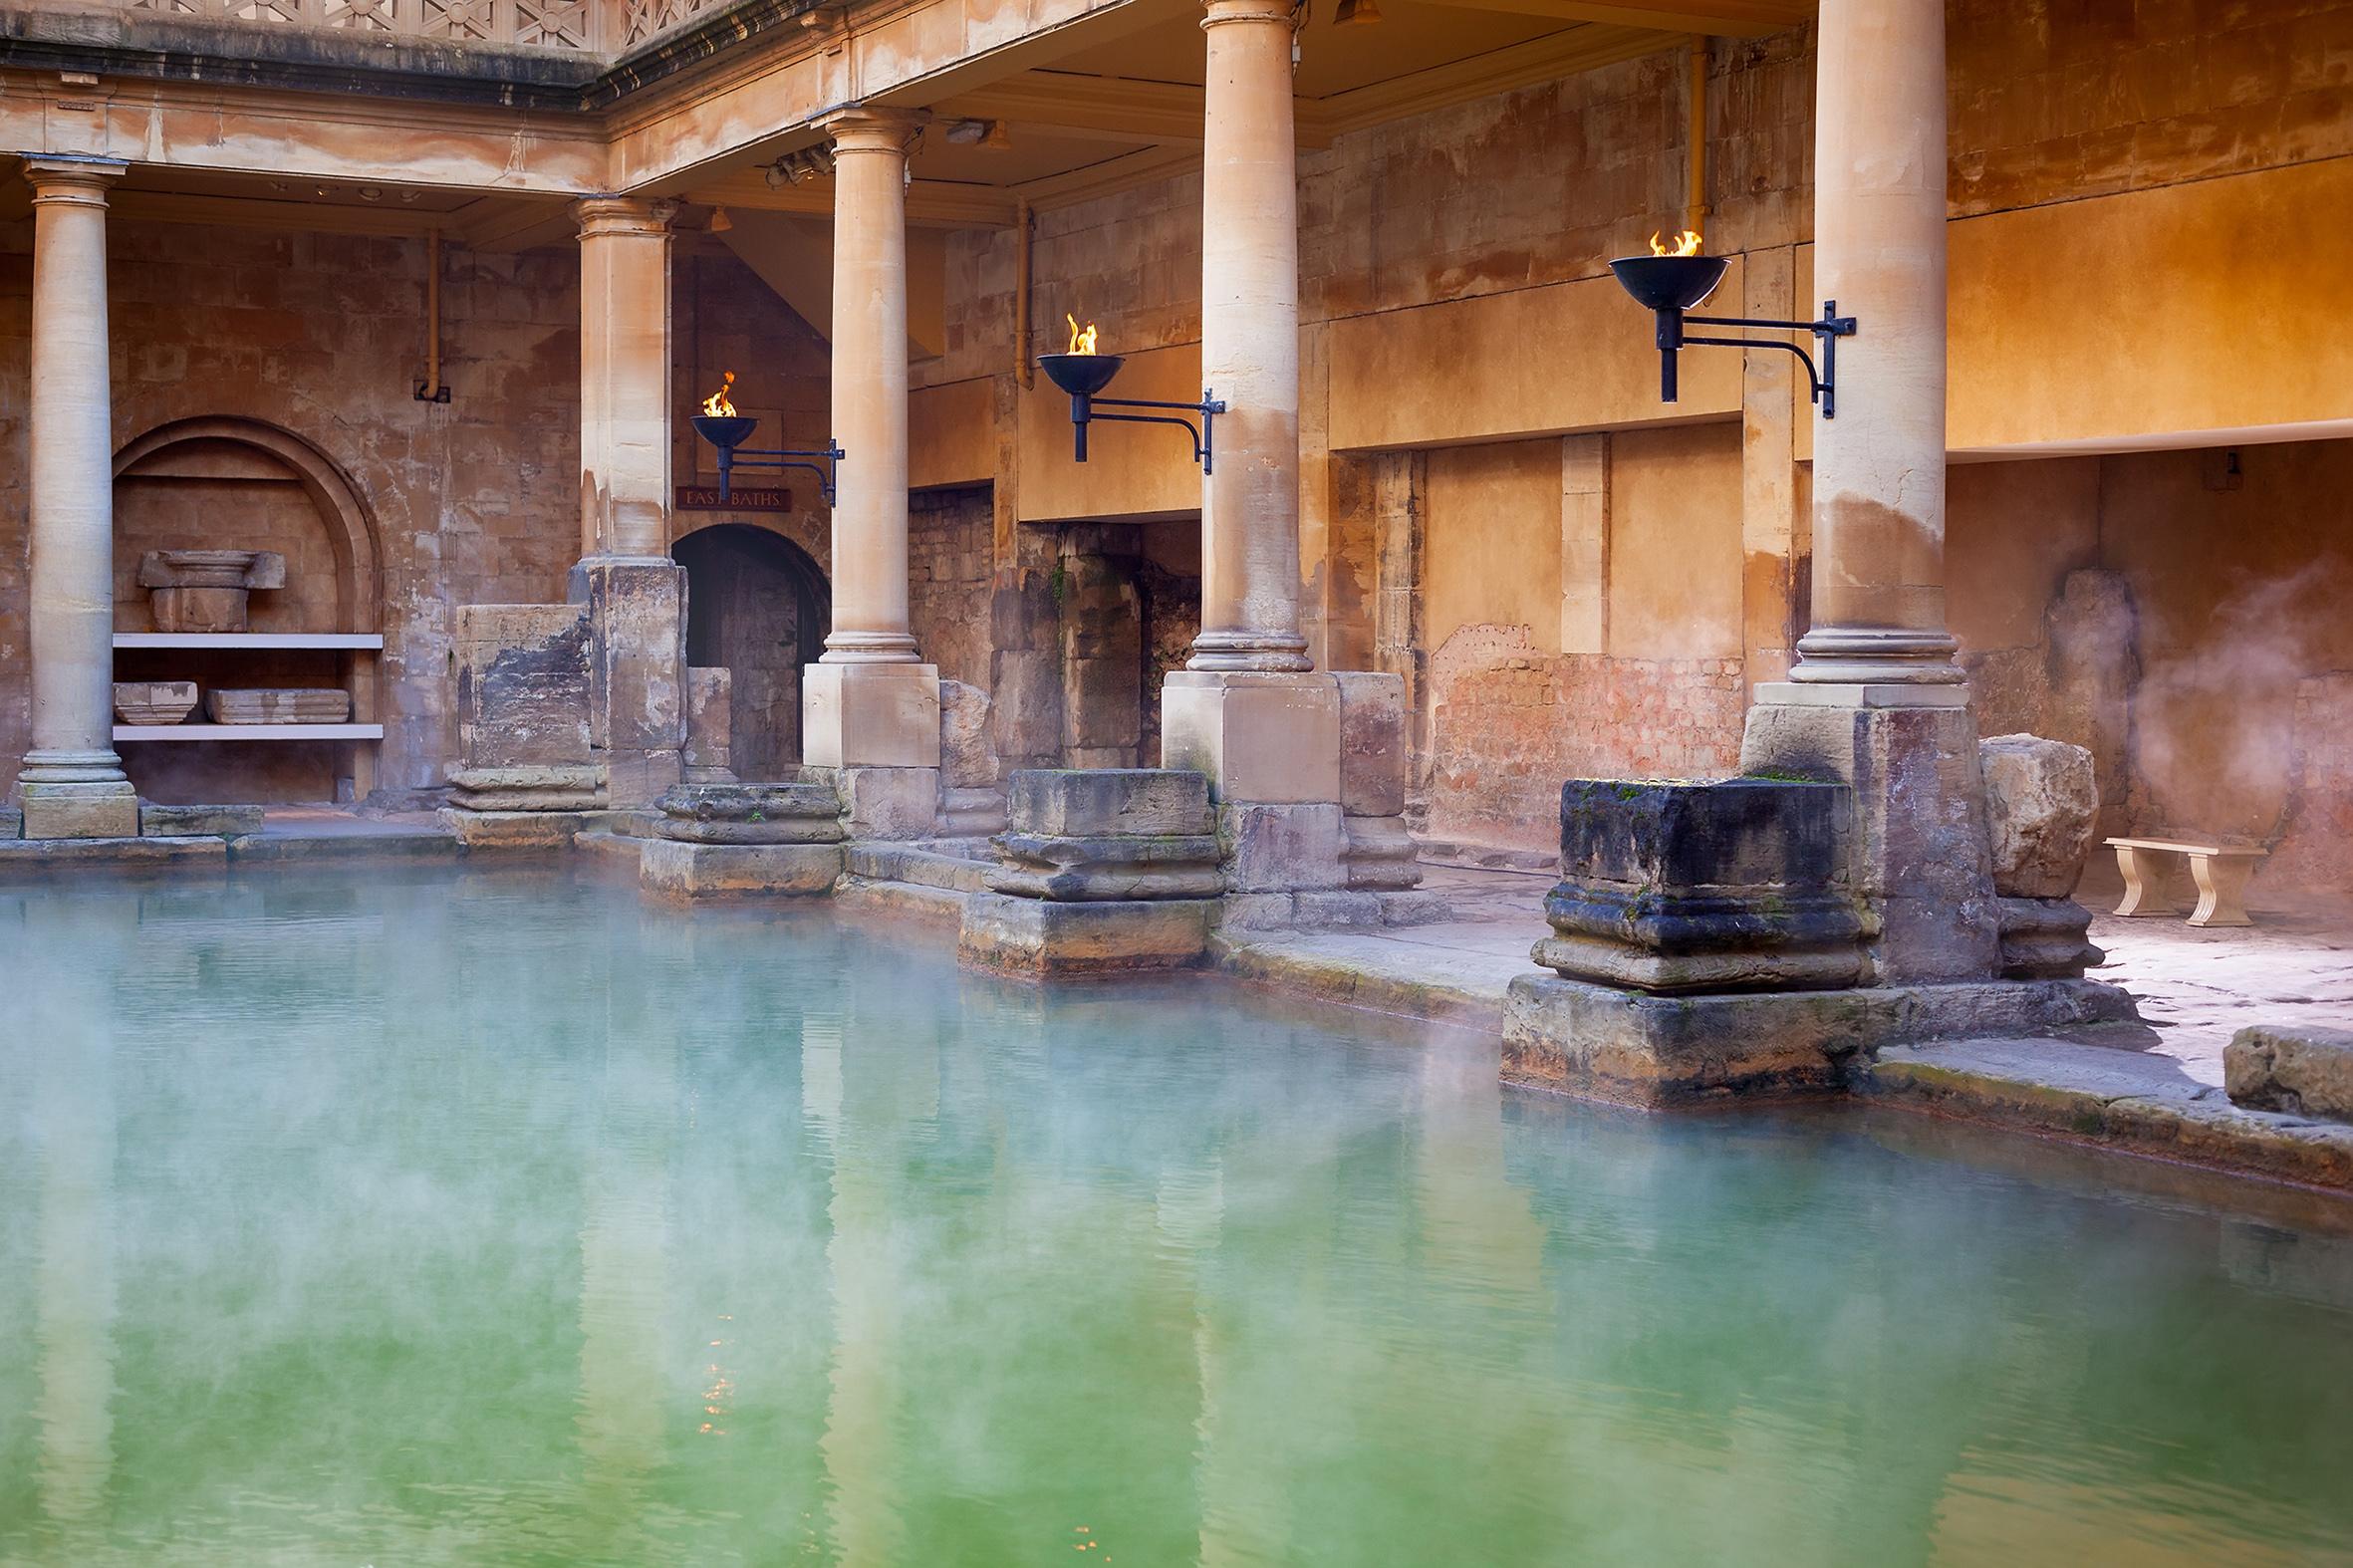 A perfect day in Bath